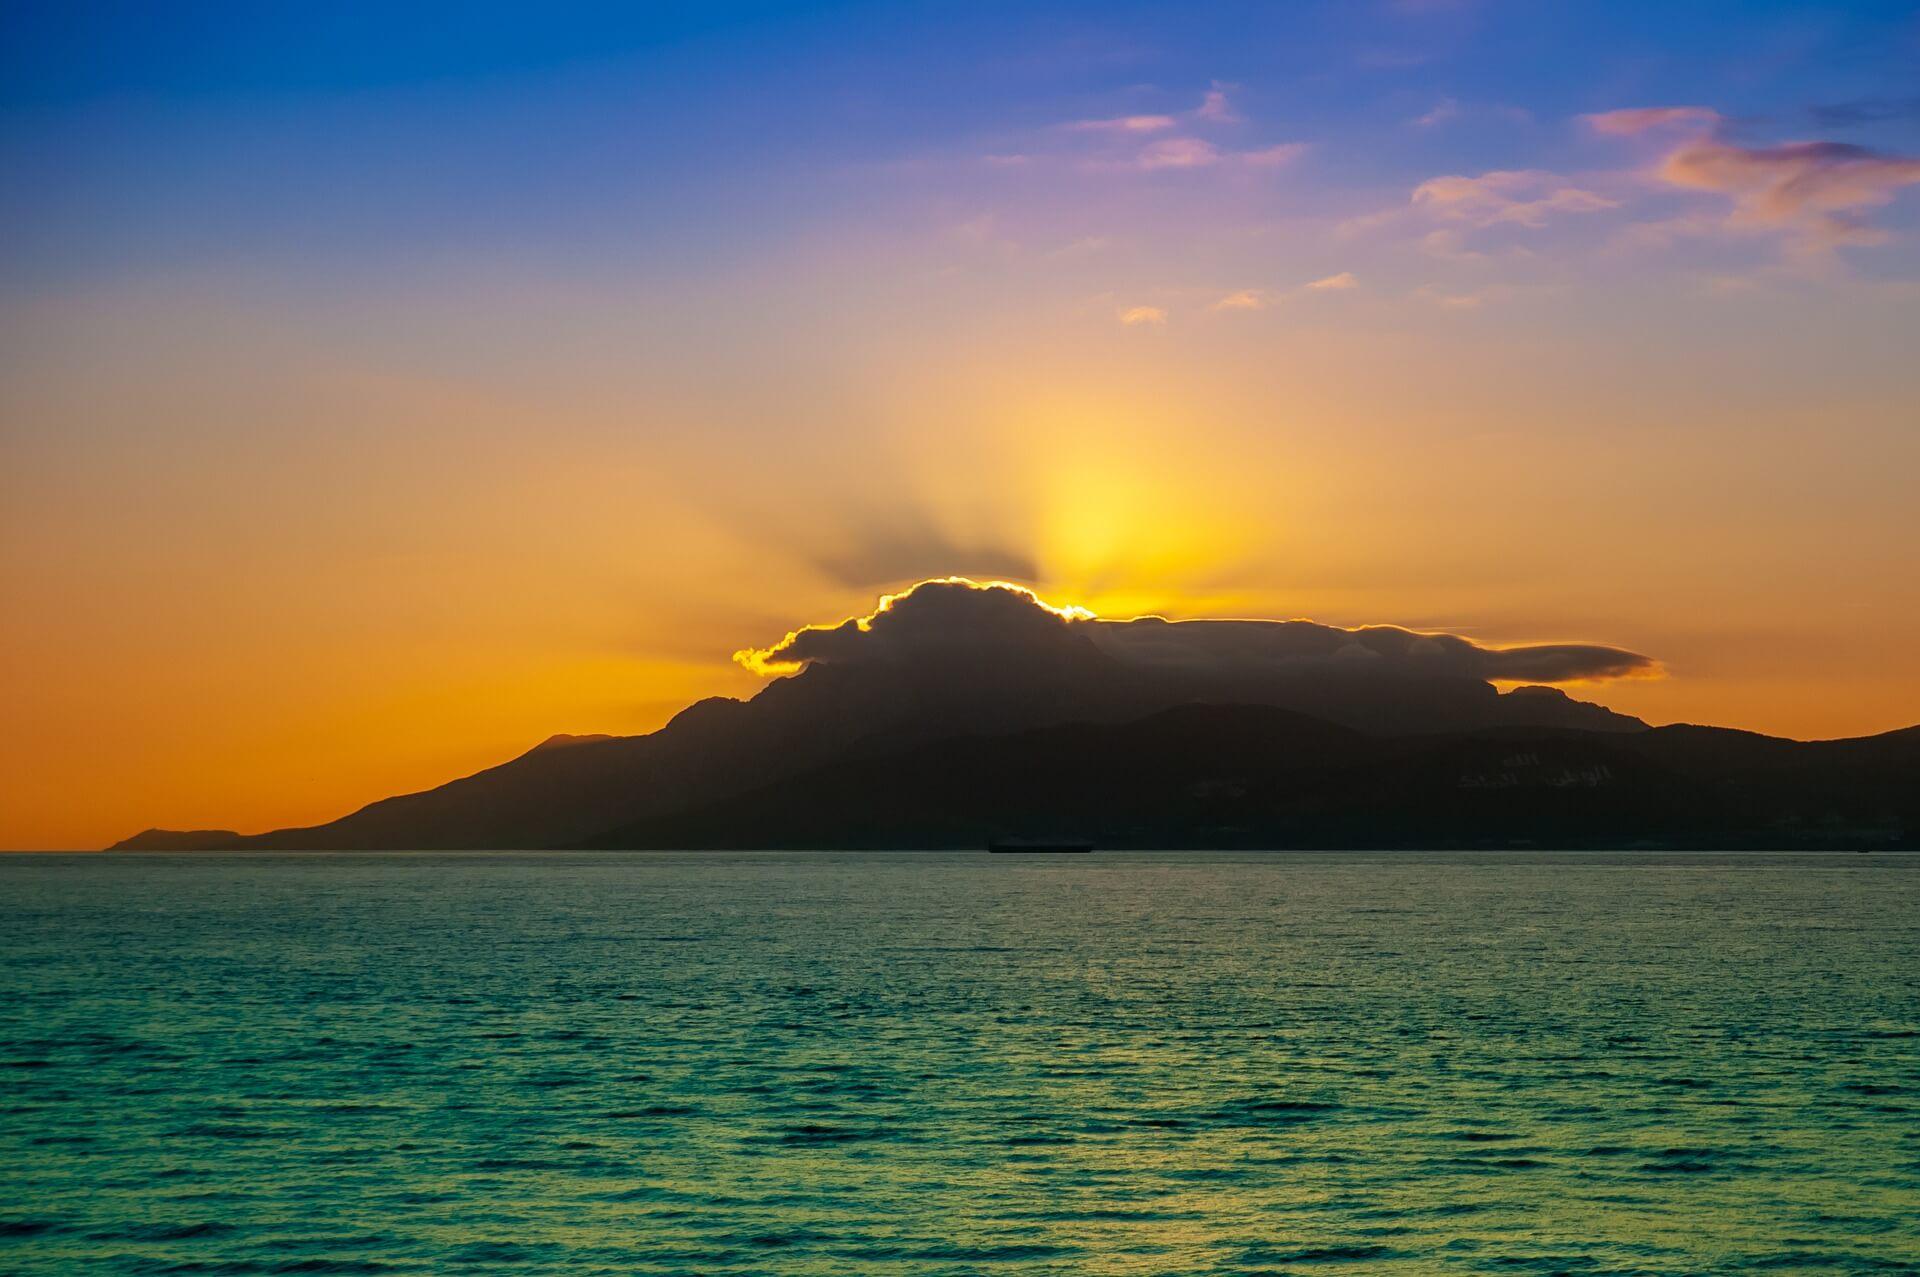 sunset-4760865_1920